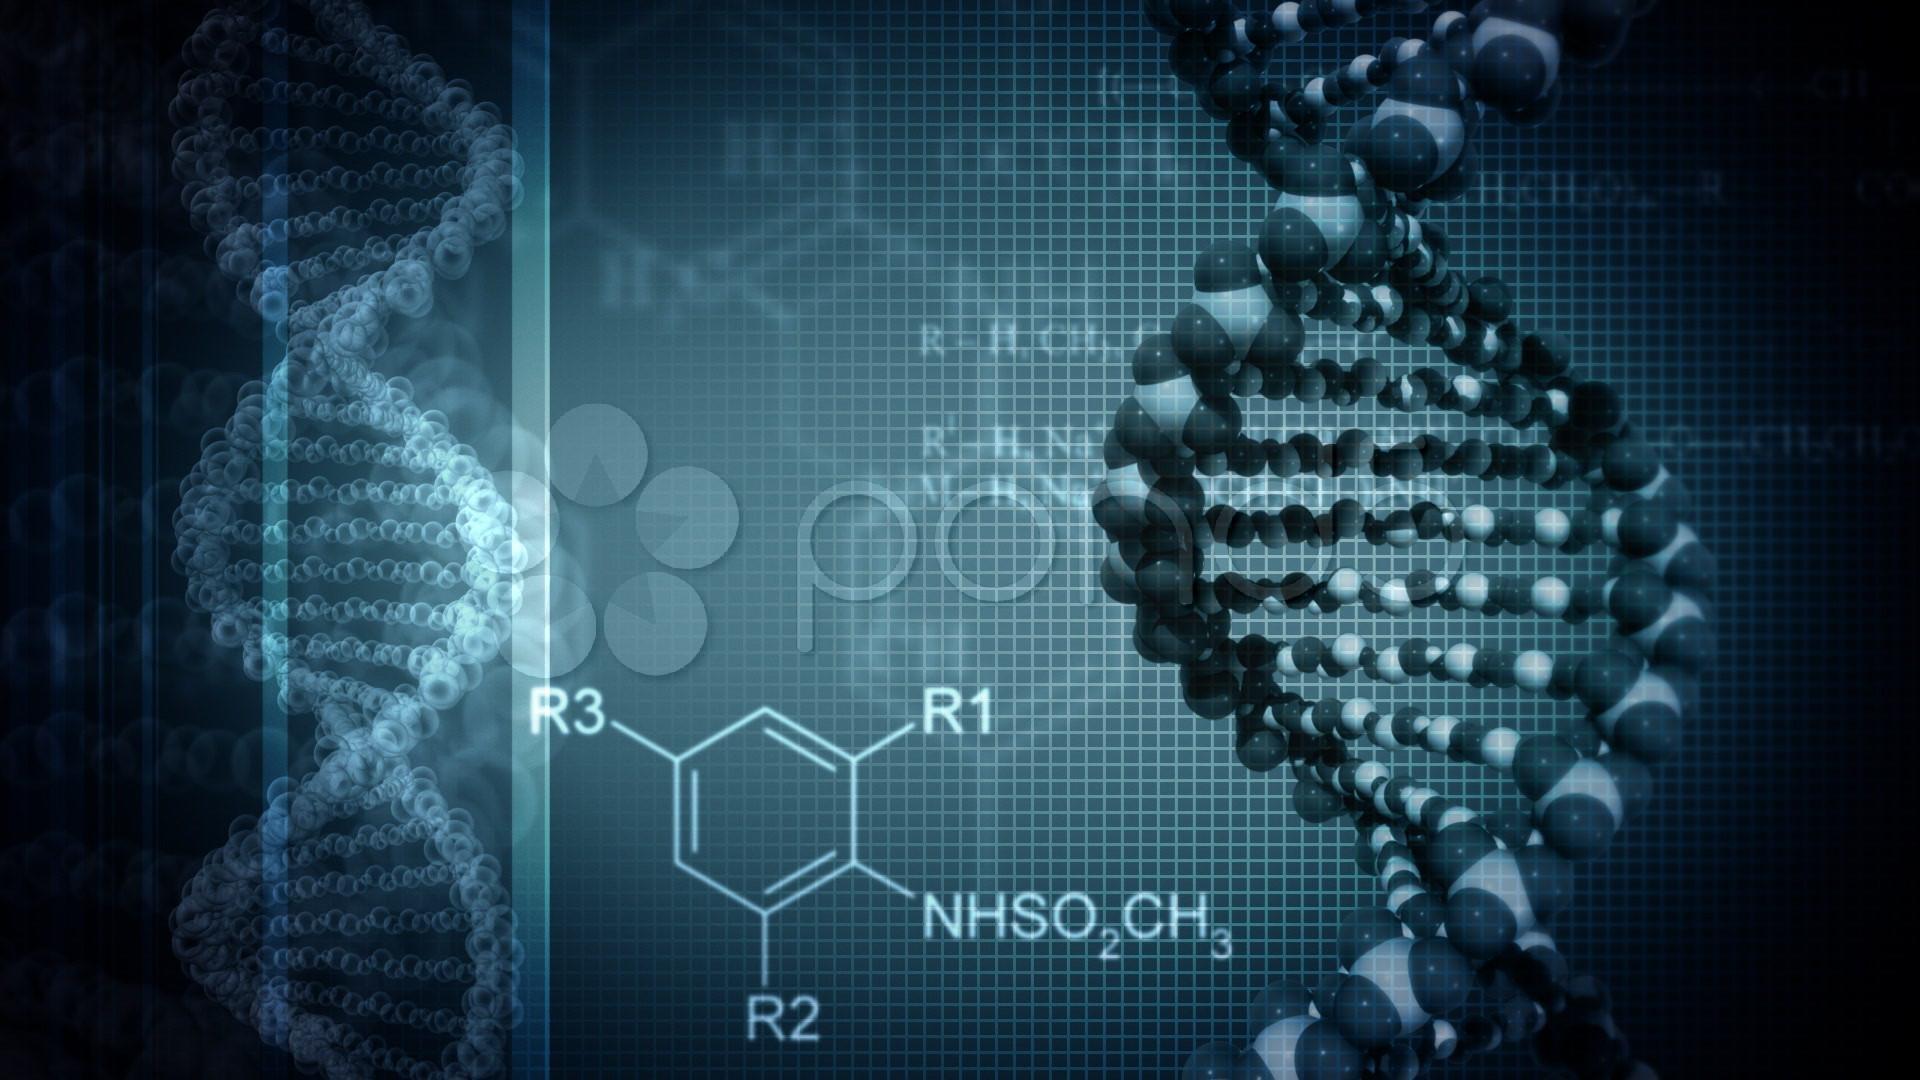 Biochemistry Wallpapers High Resolution